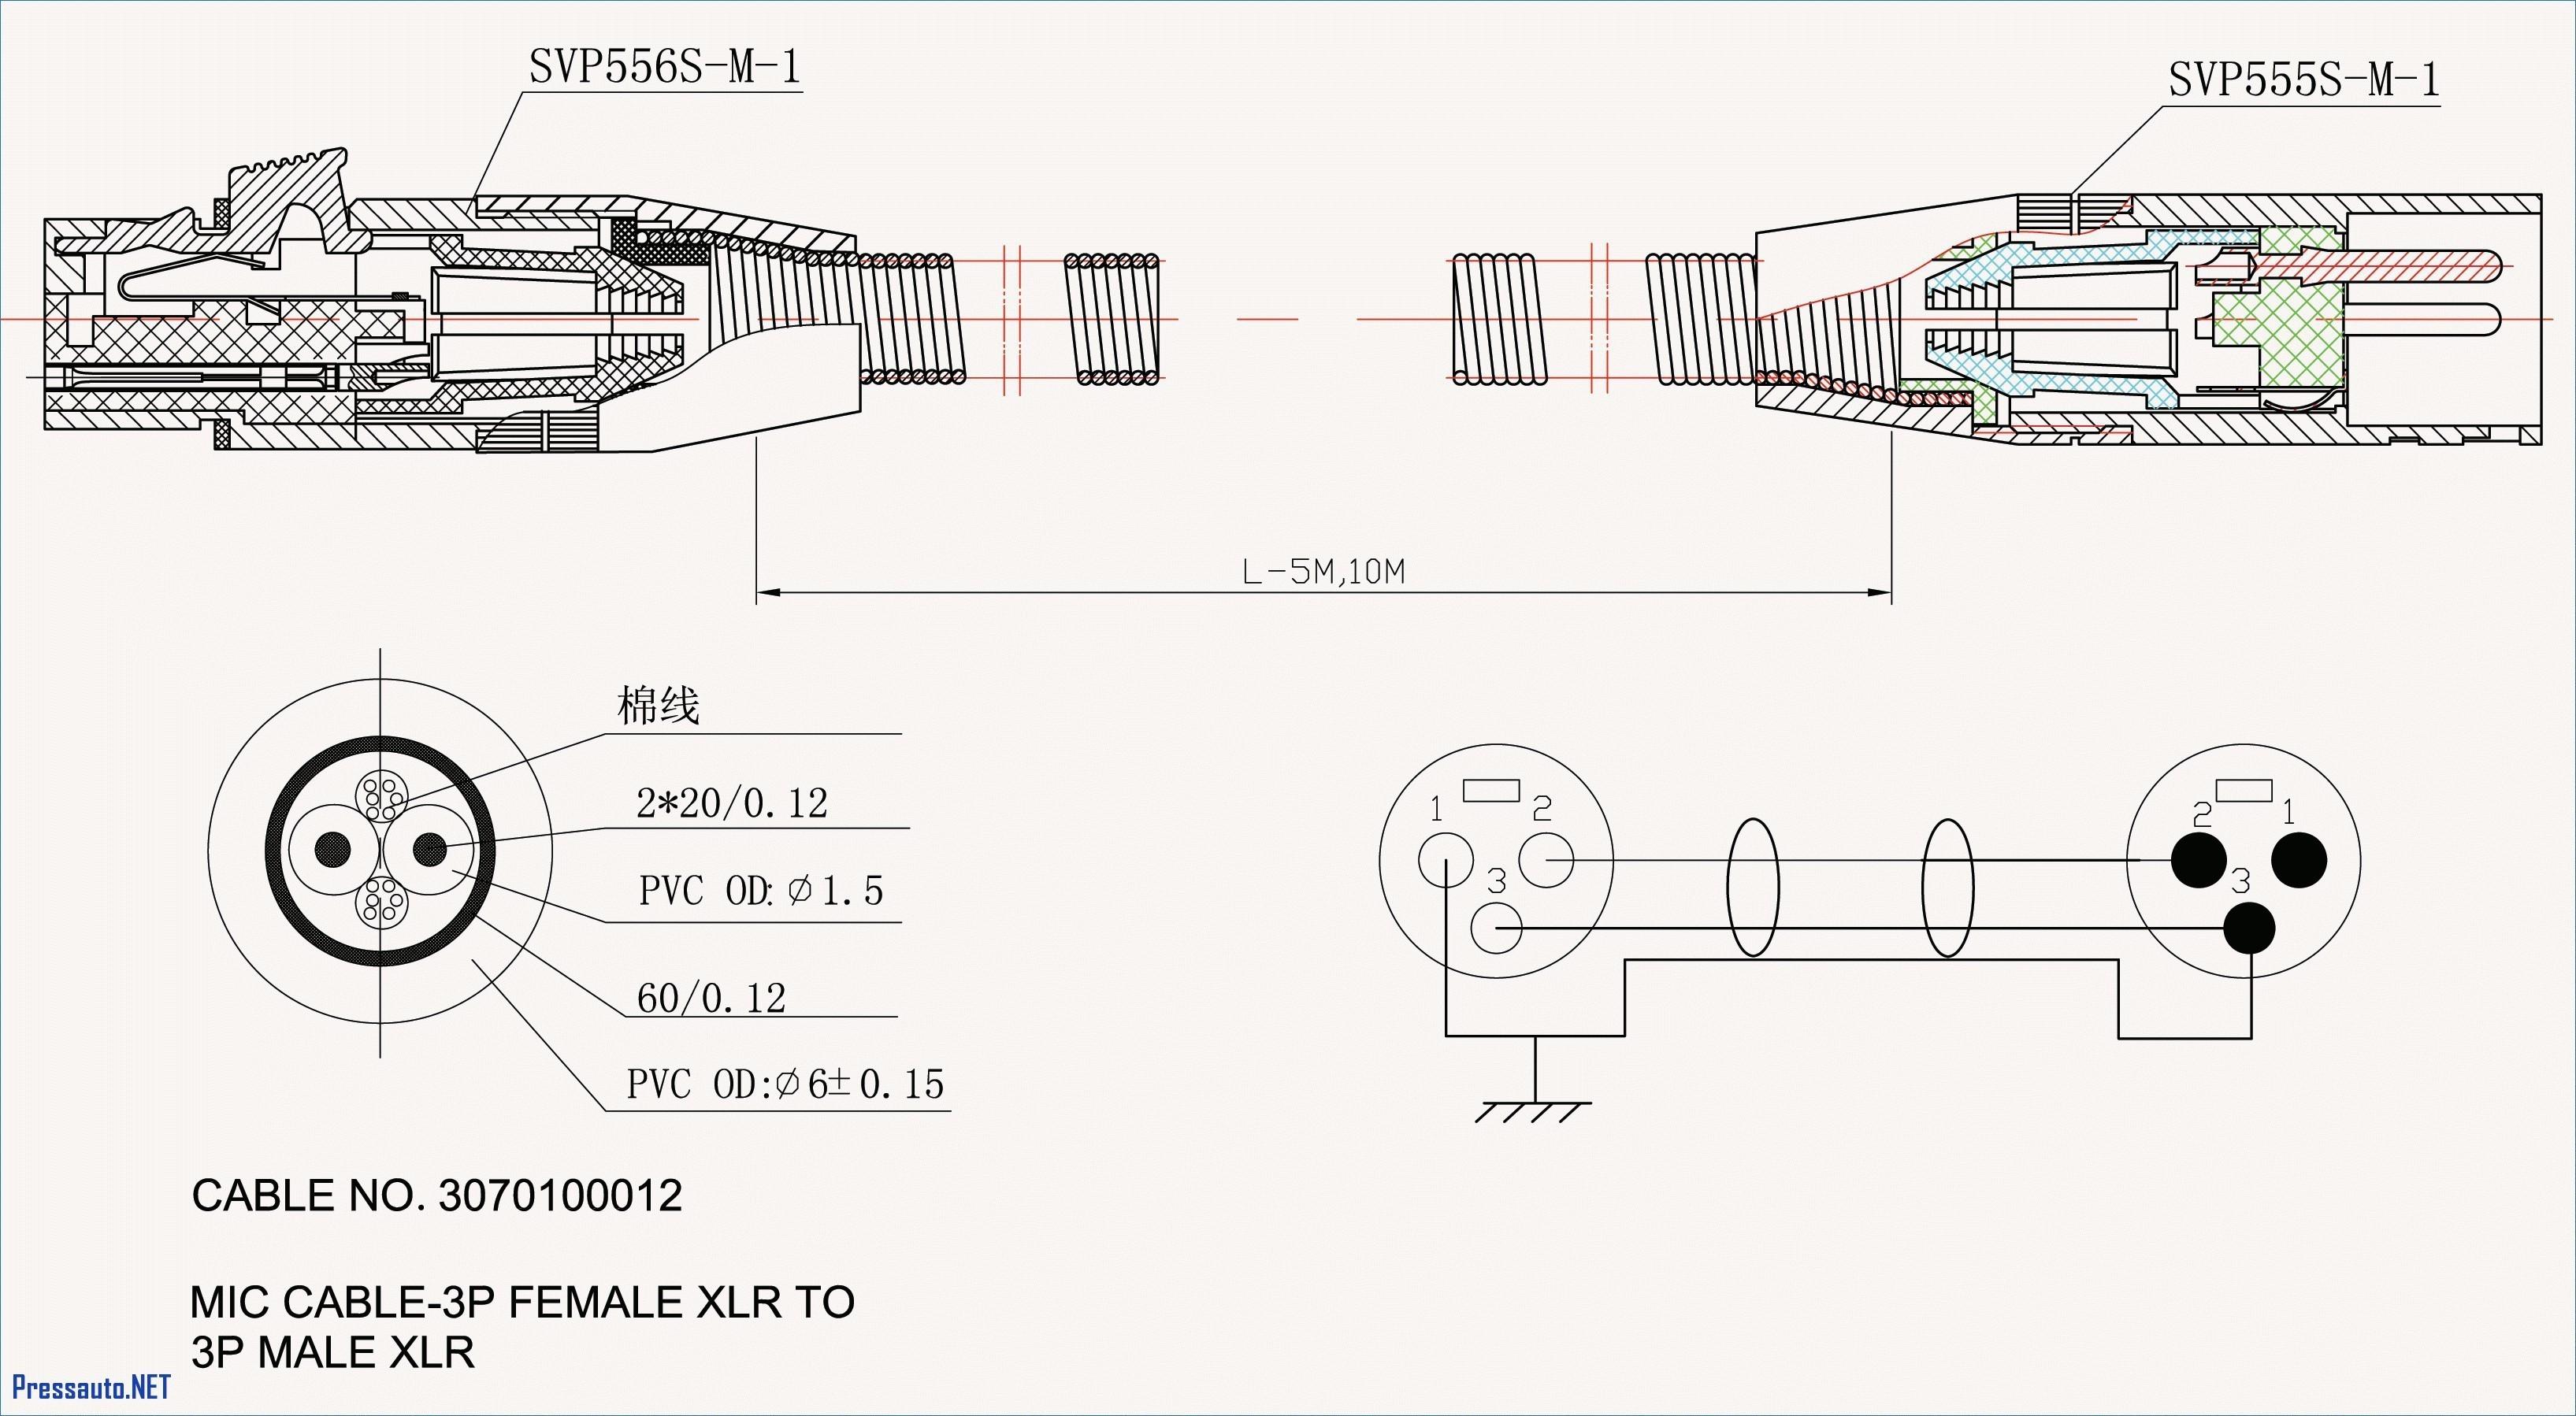 Car Alternator Connection Diagram Best Mopar Starter Relay Wiring Diagram • Electrical Outlet Of Car Alternator Connection Diagram